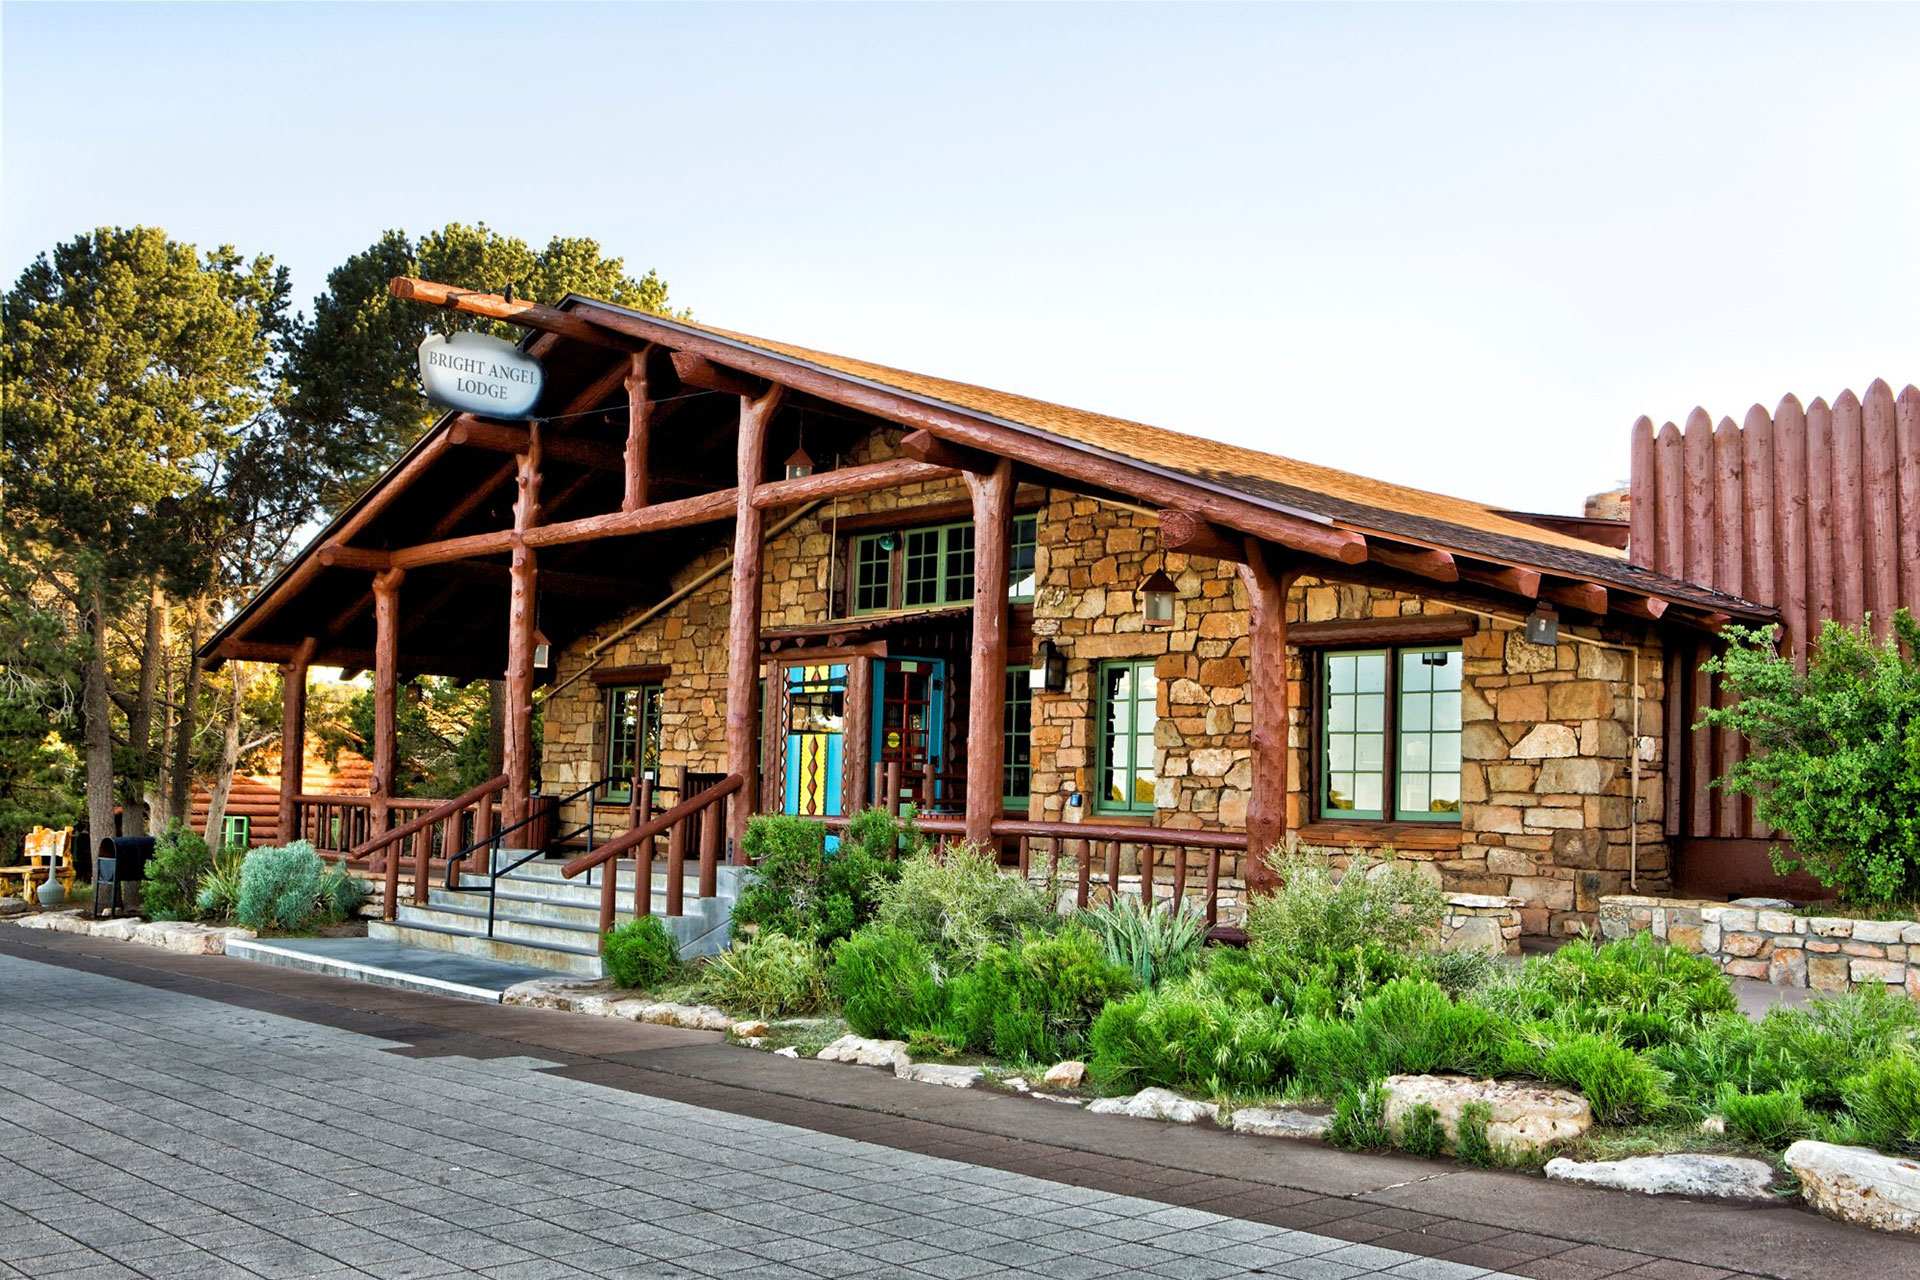 Bright Angel Lodge; Courtesy of Bright Angel Lodge